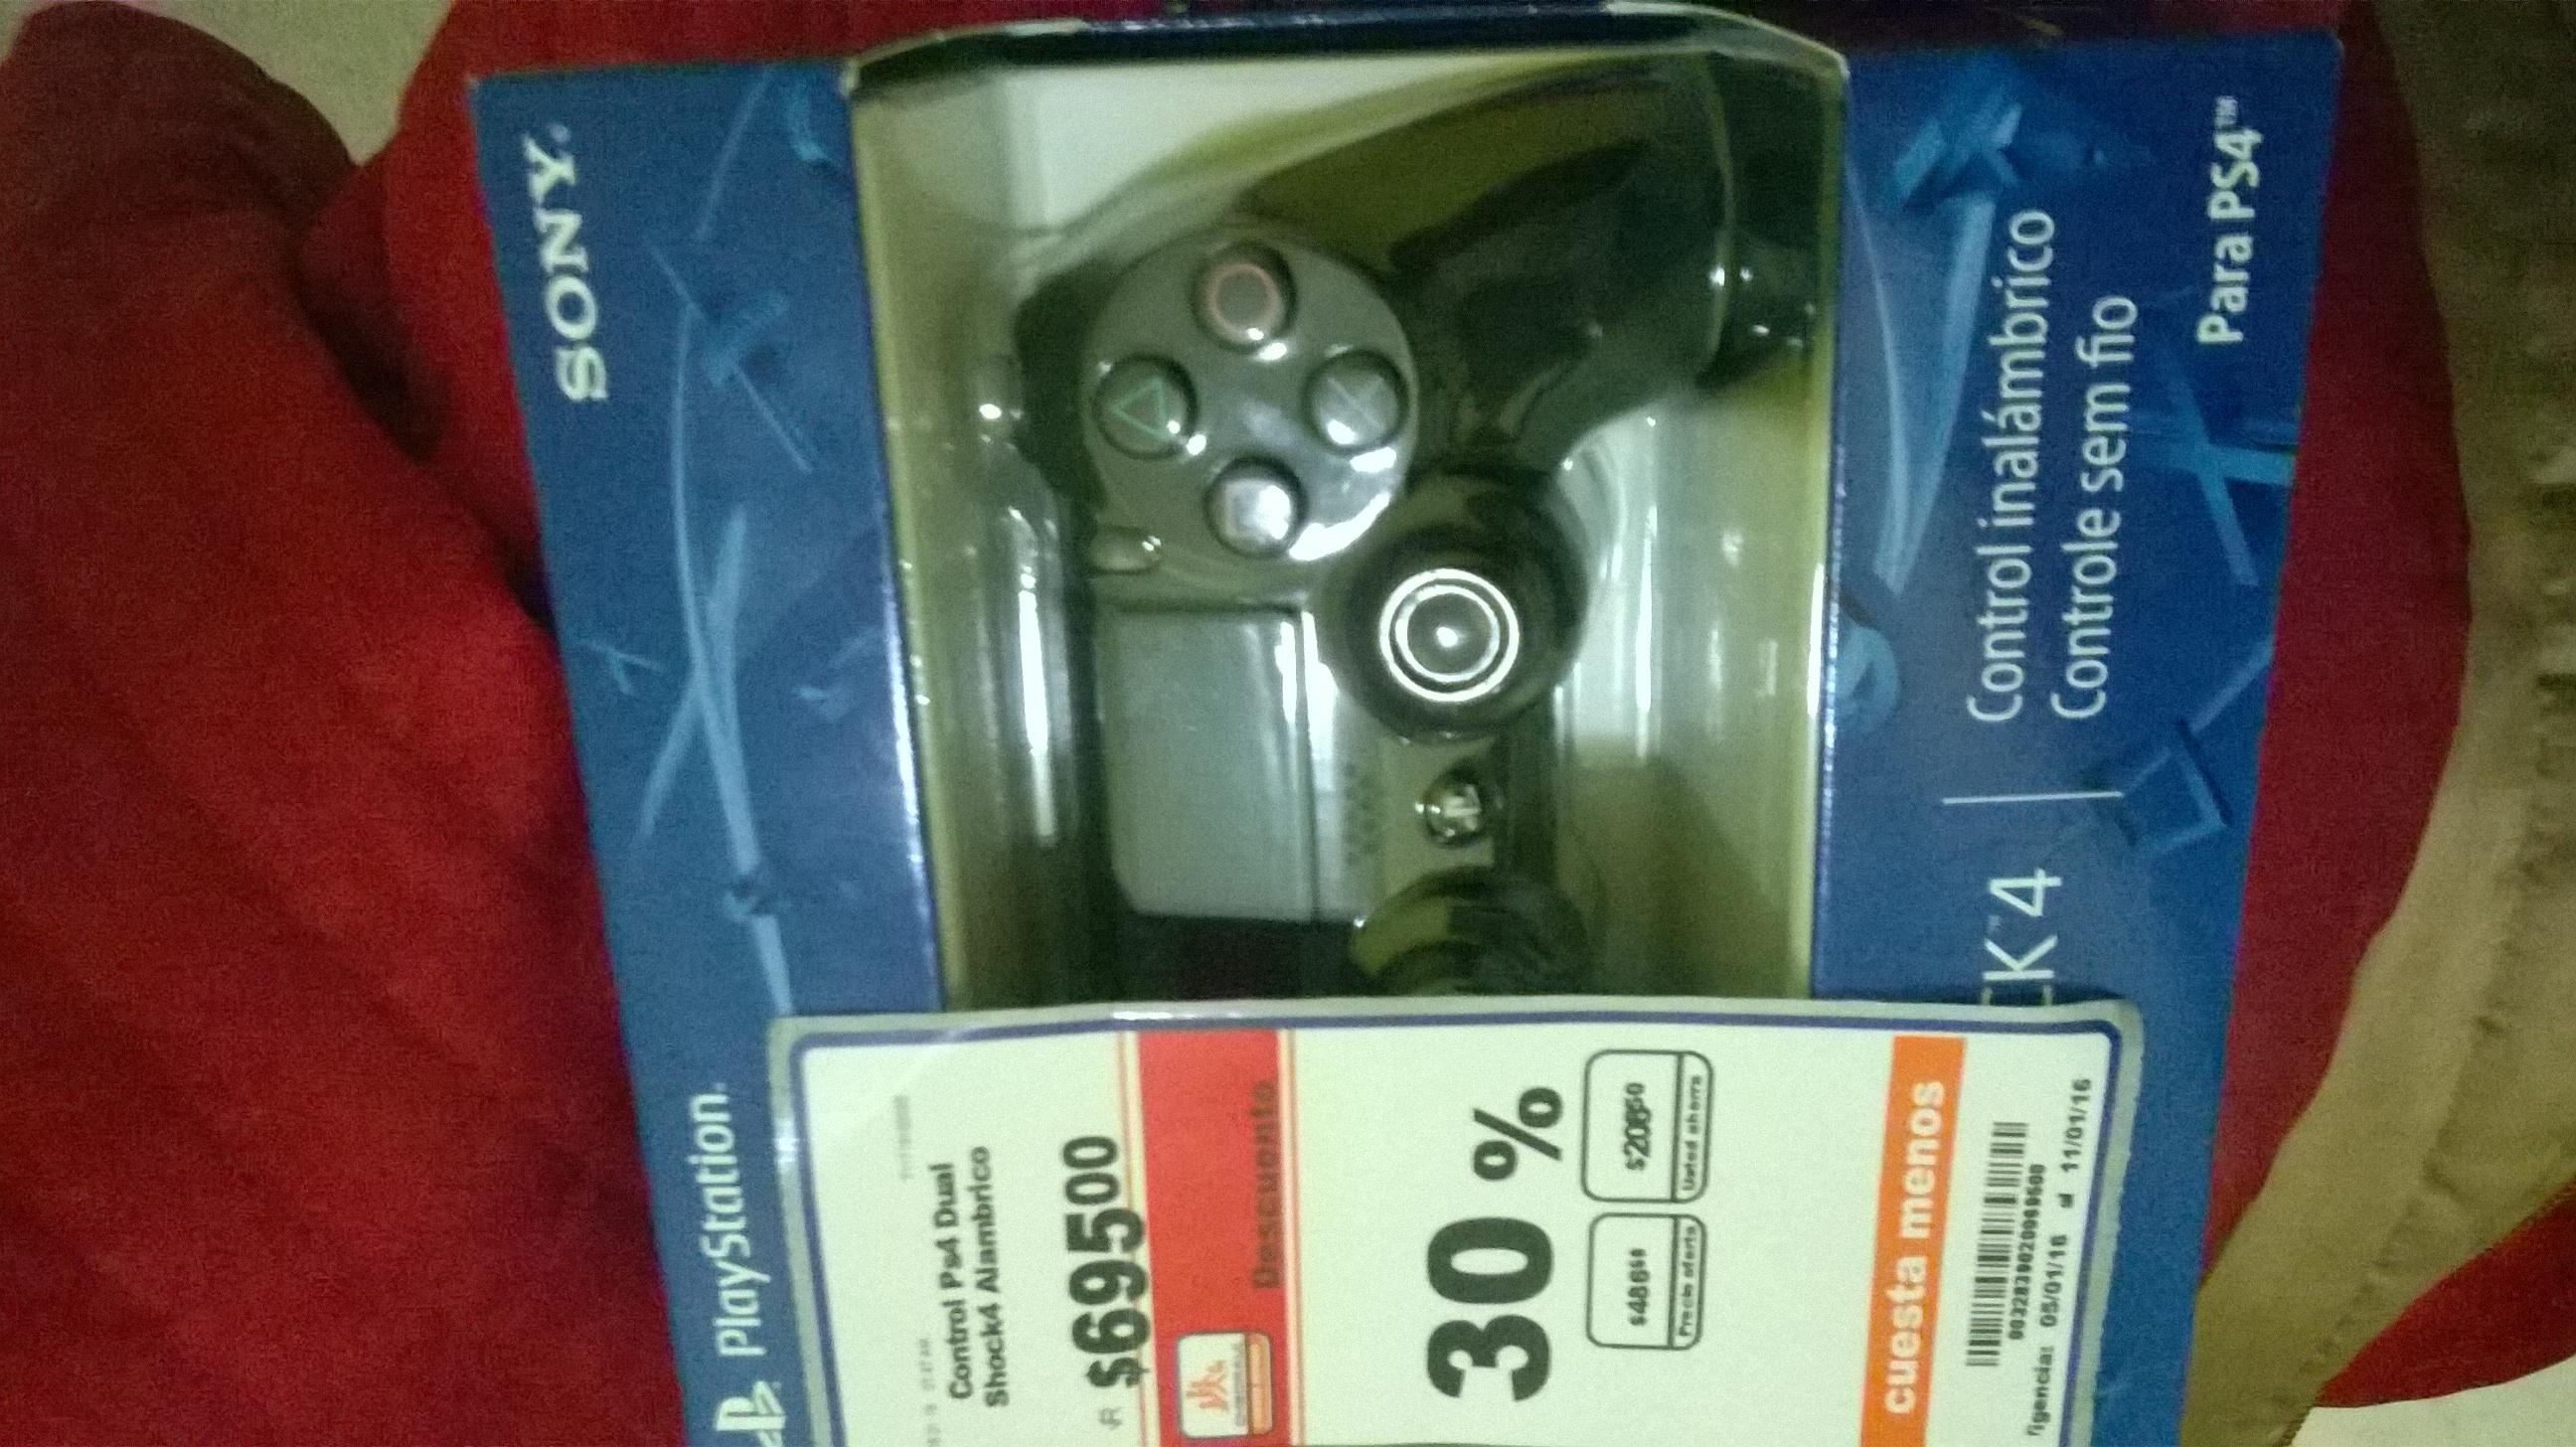 Chedraui: control de PS4 inalambrico $486.50